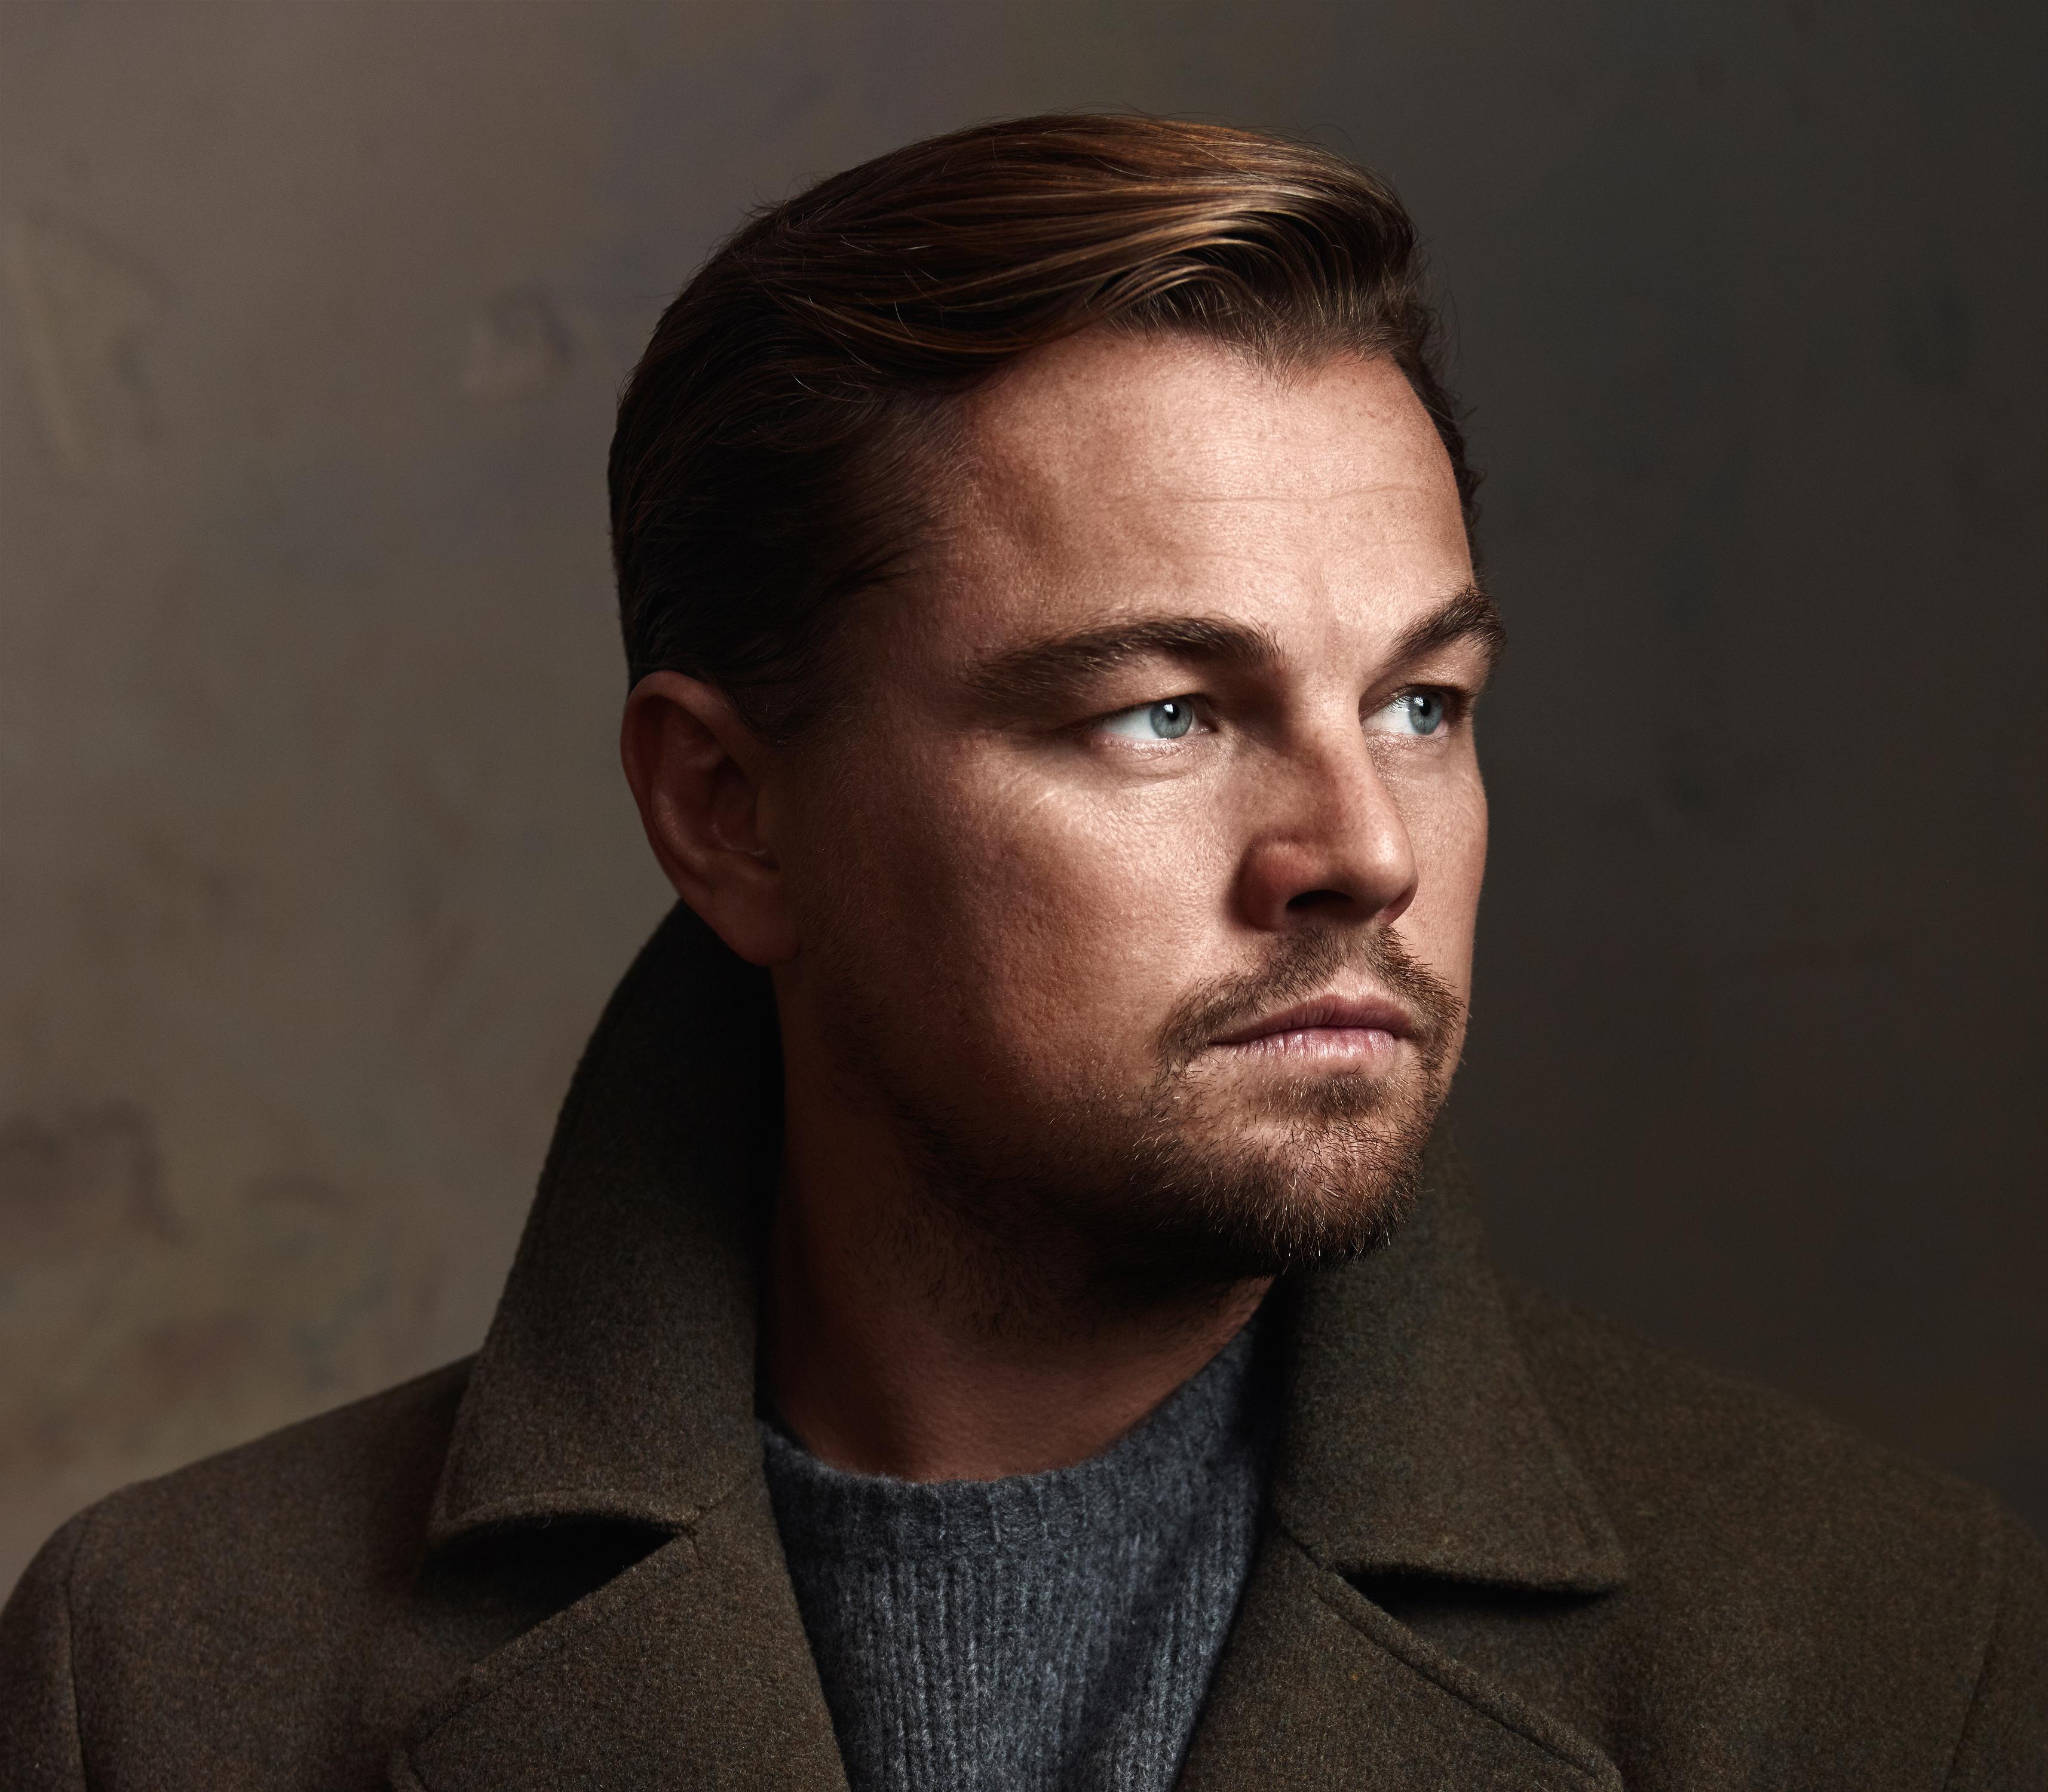 Leonardo Dicaprio Wallpapers Pictures Images 3428x3000